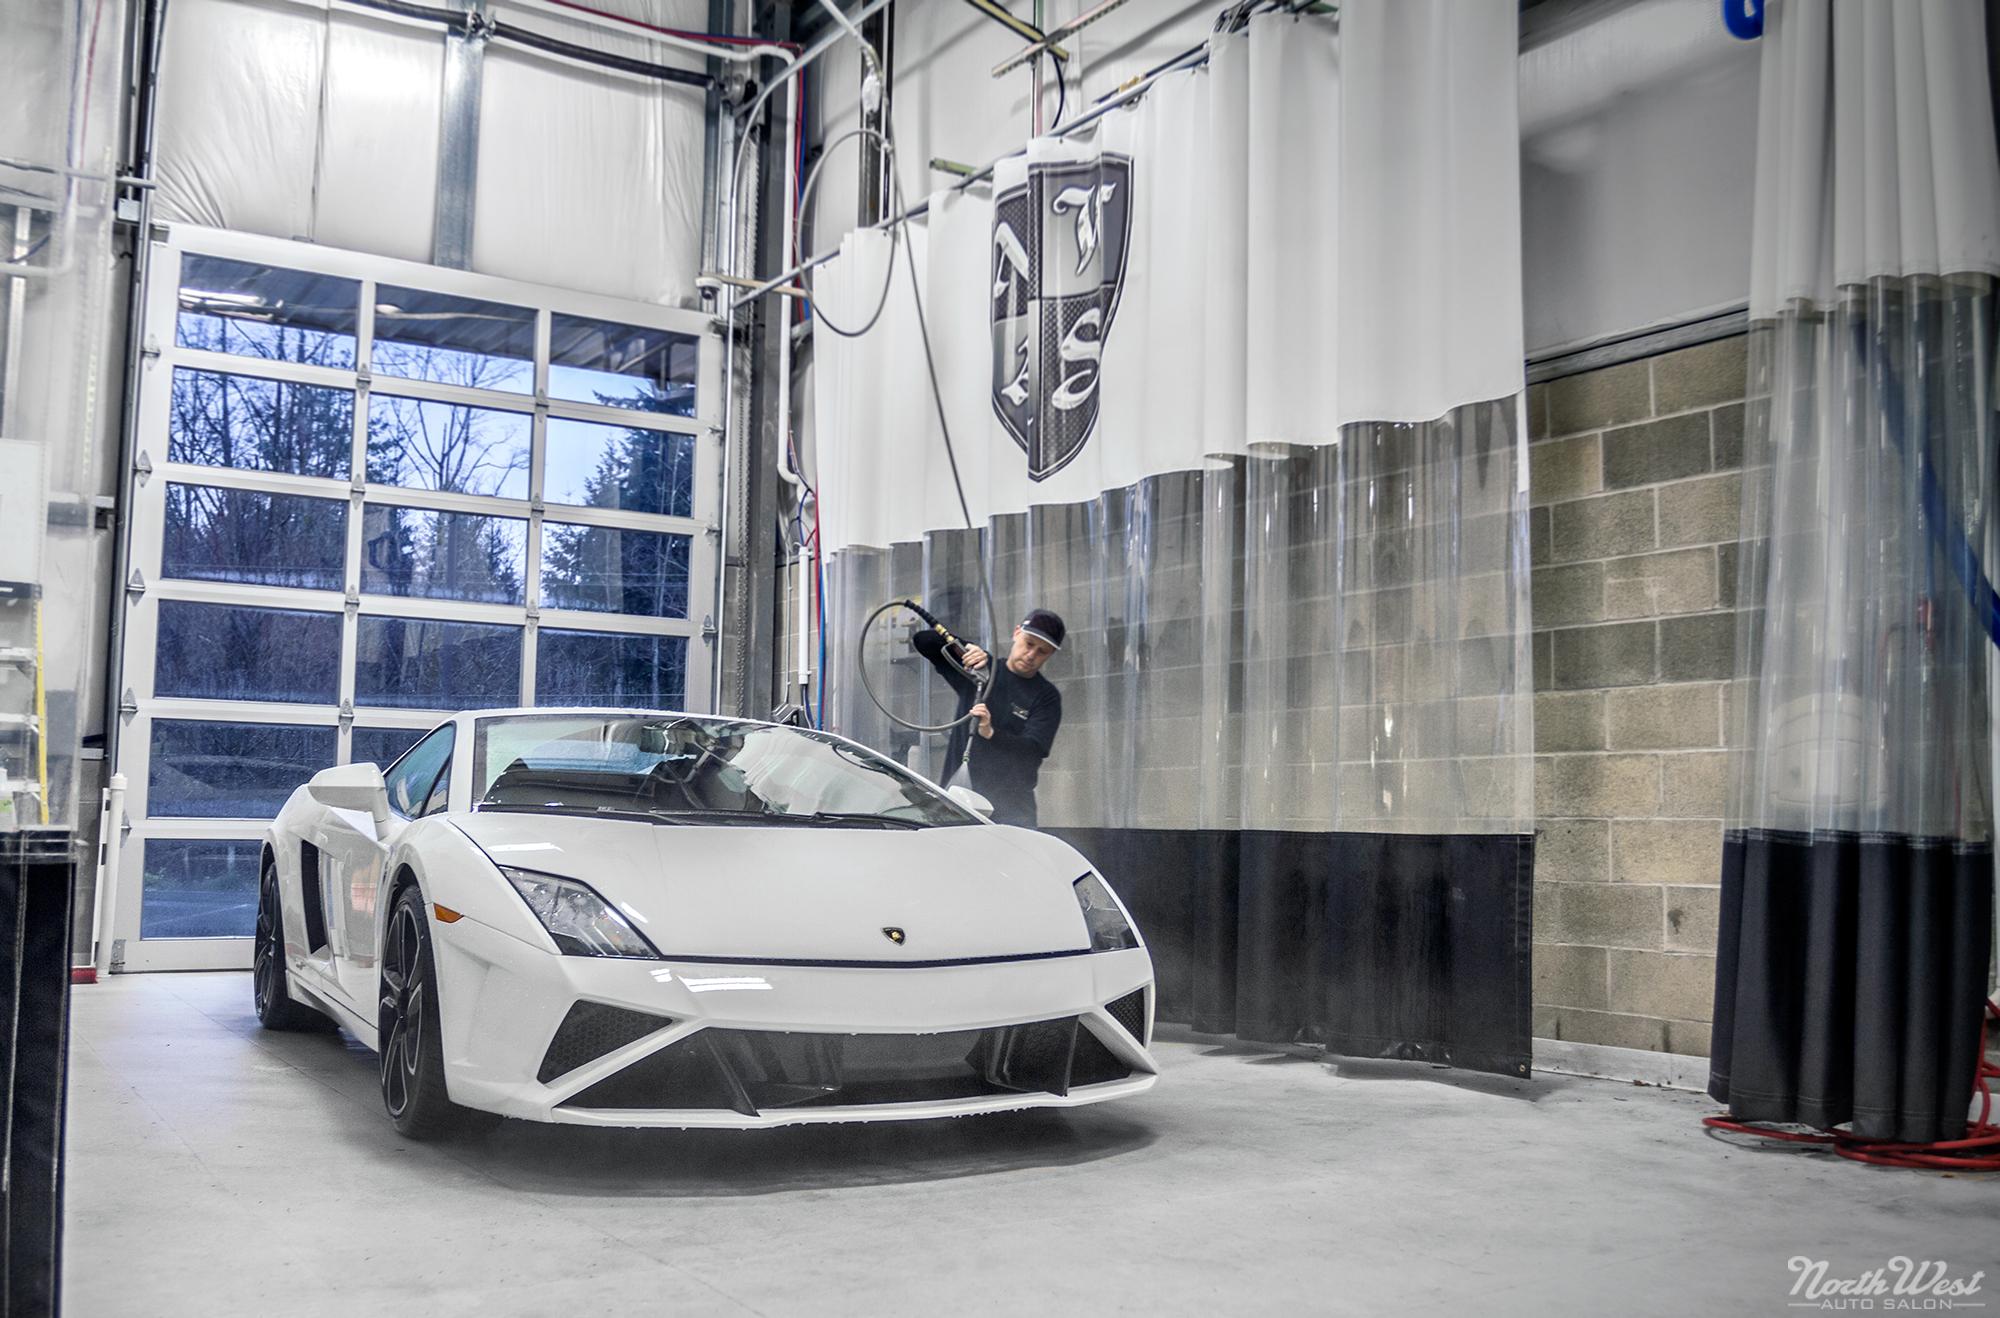 Car Detail Shop >> Analyze Troupe Quick Look 2013 Lamborghini Gallardo New